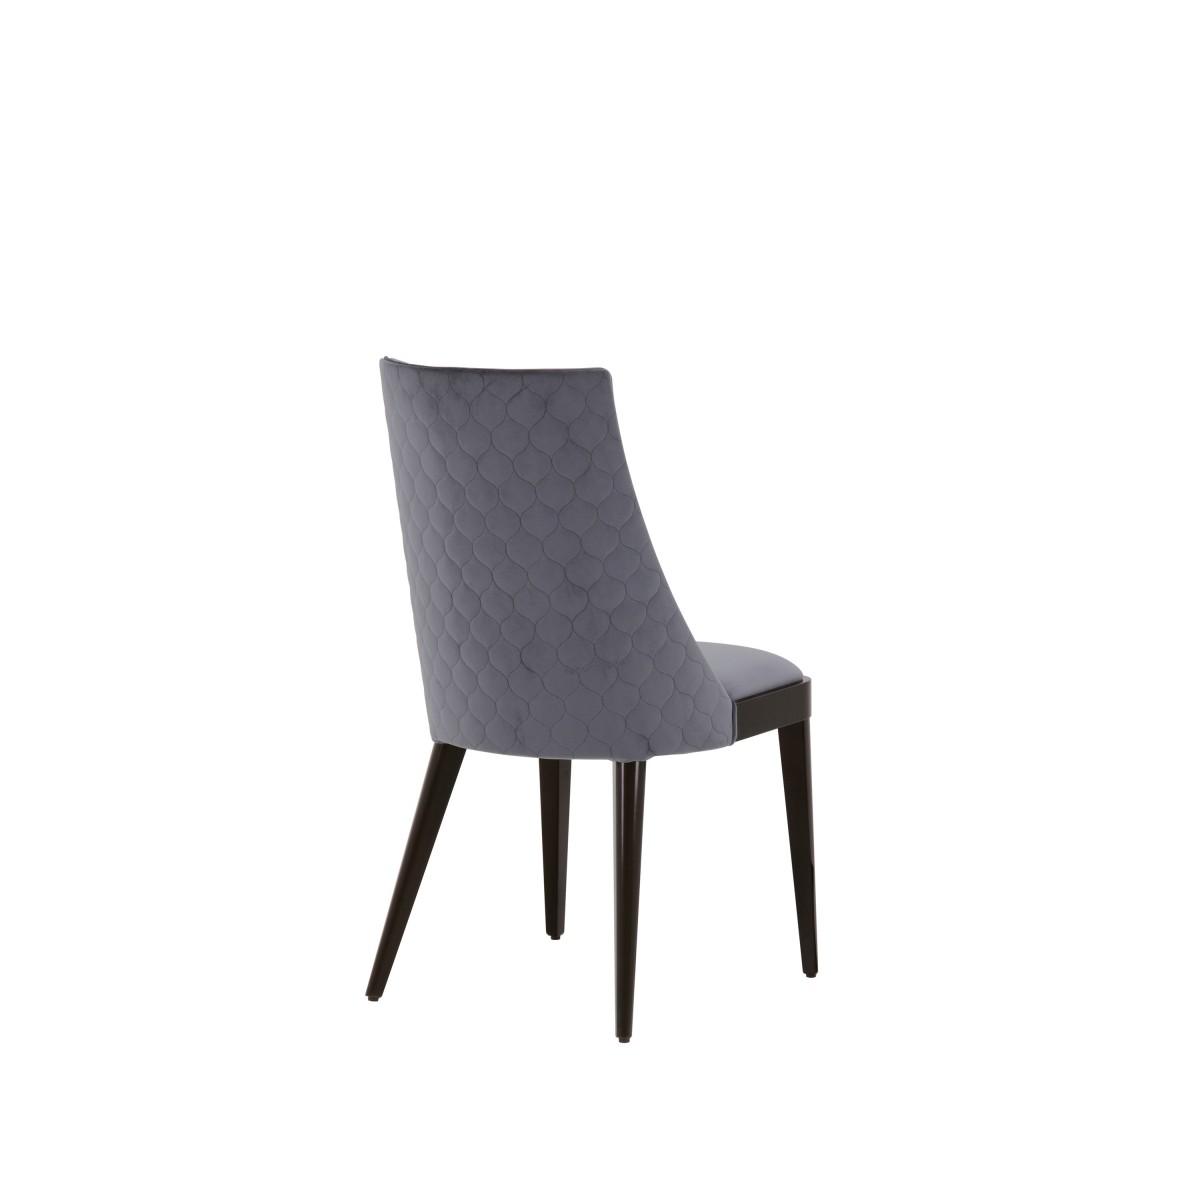 3666 modern style wood chair norvegia7